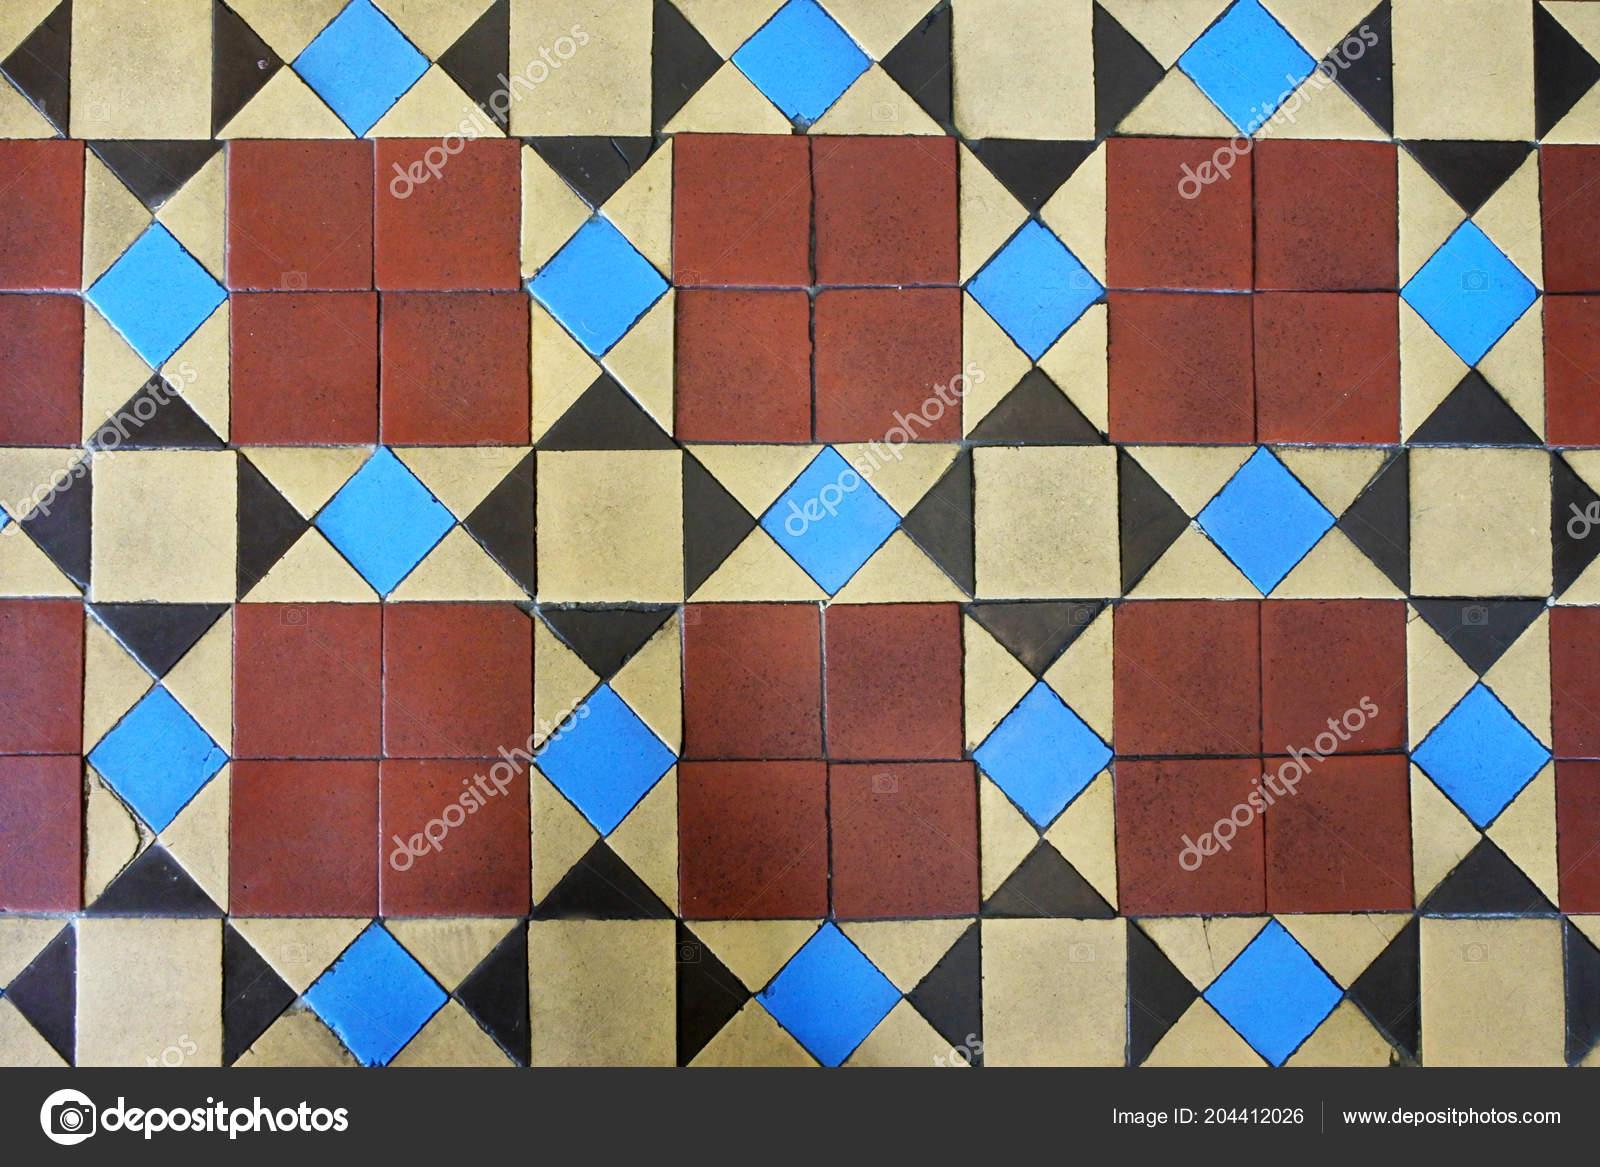 Vintage vecchio pavimento piastrelle sfondo design sfondi texture